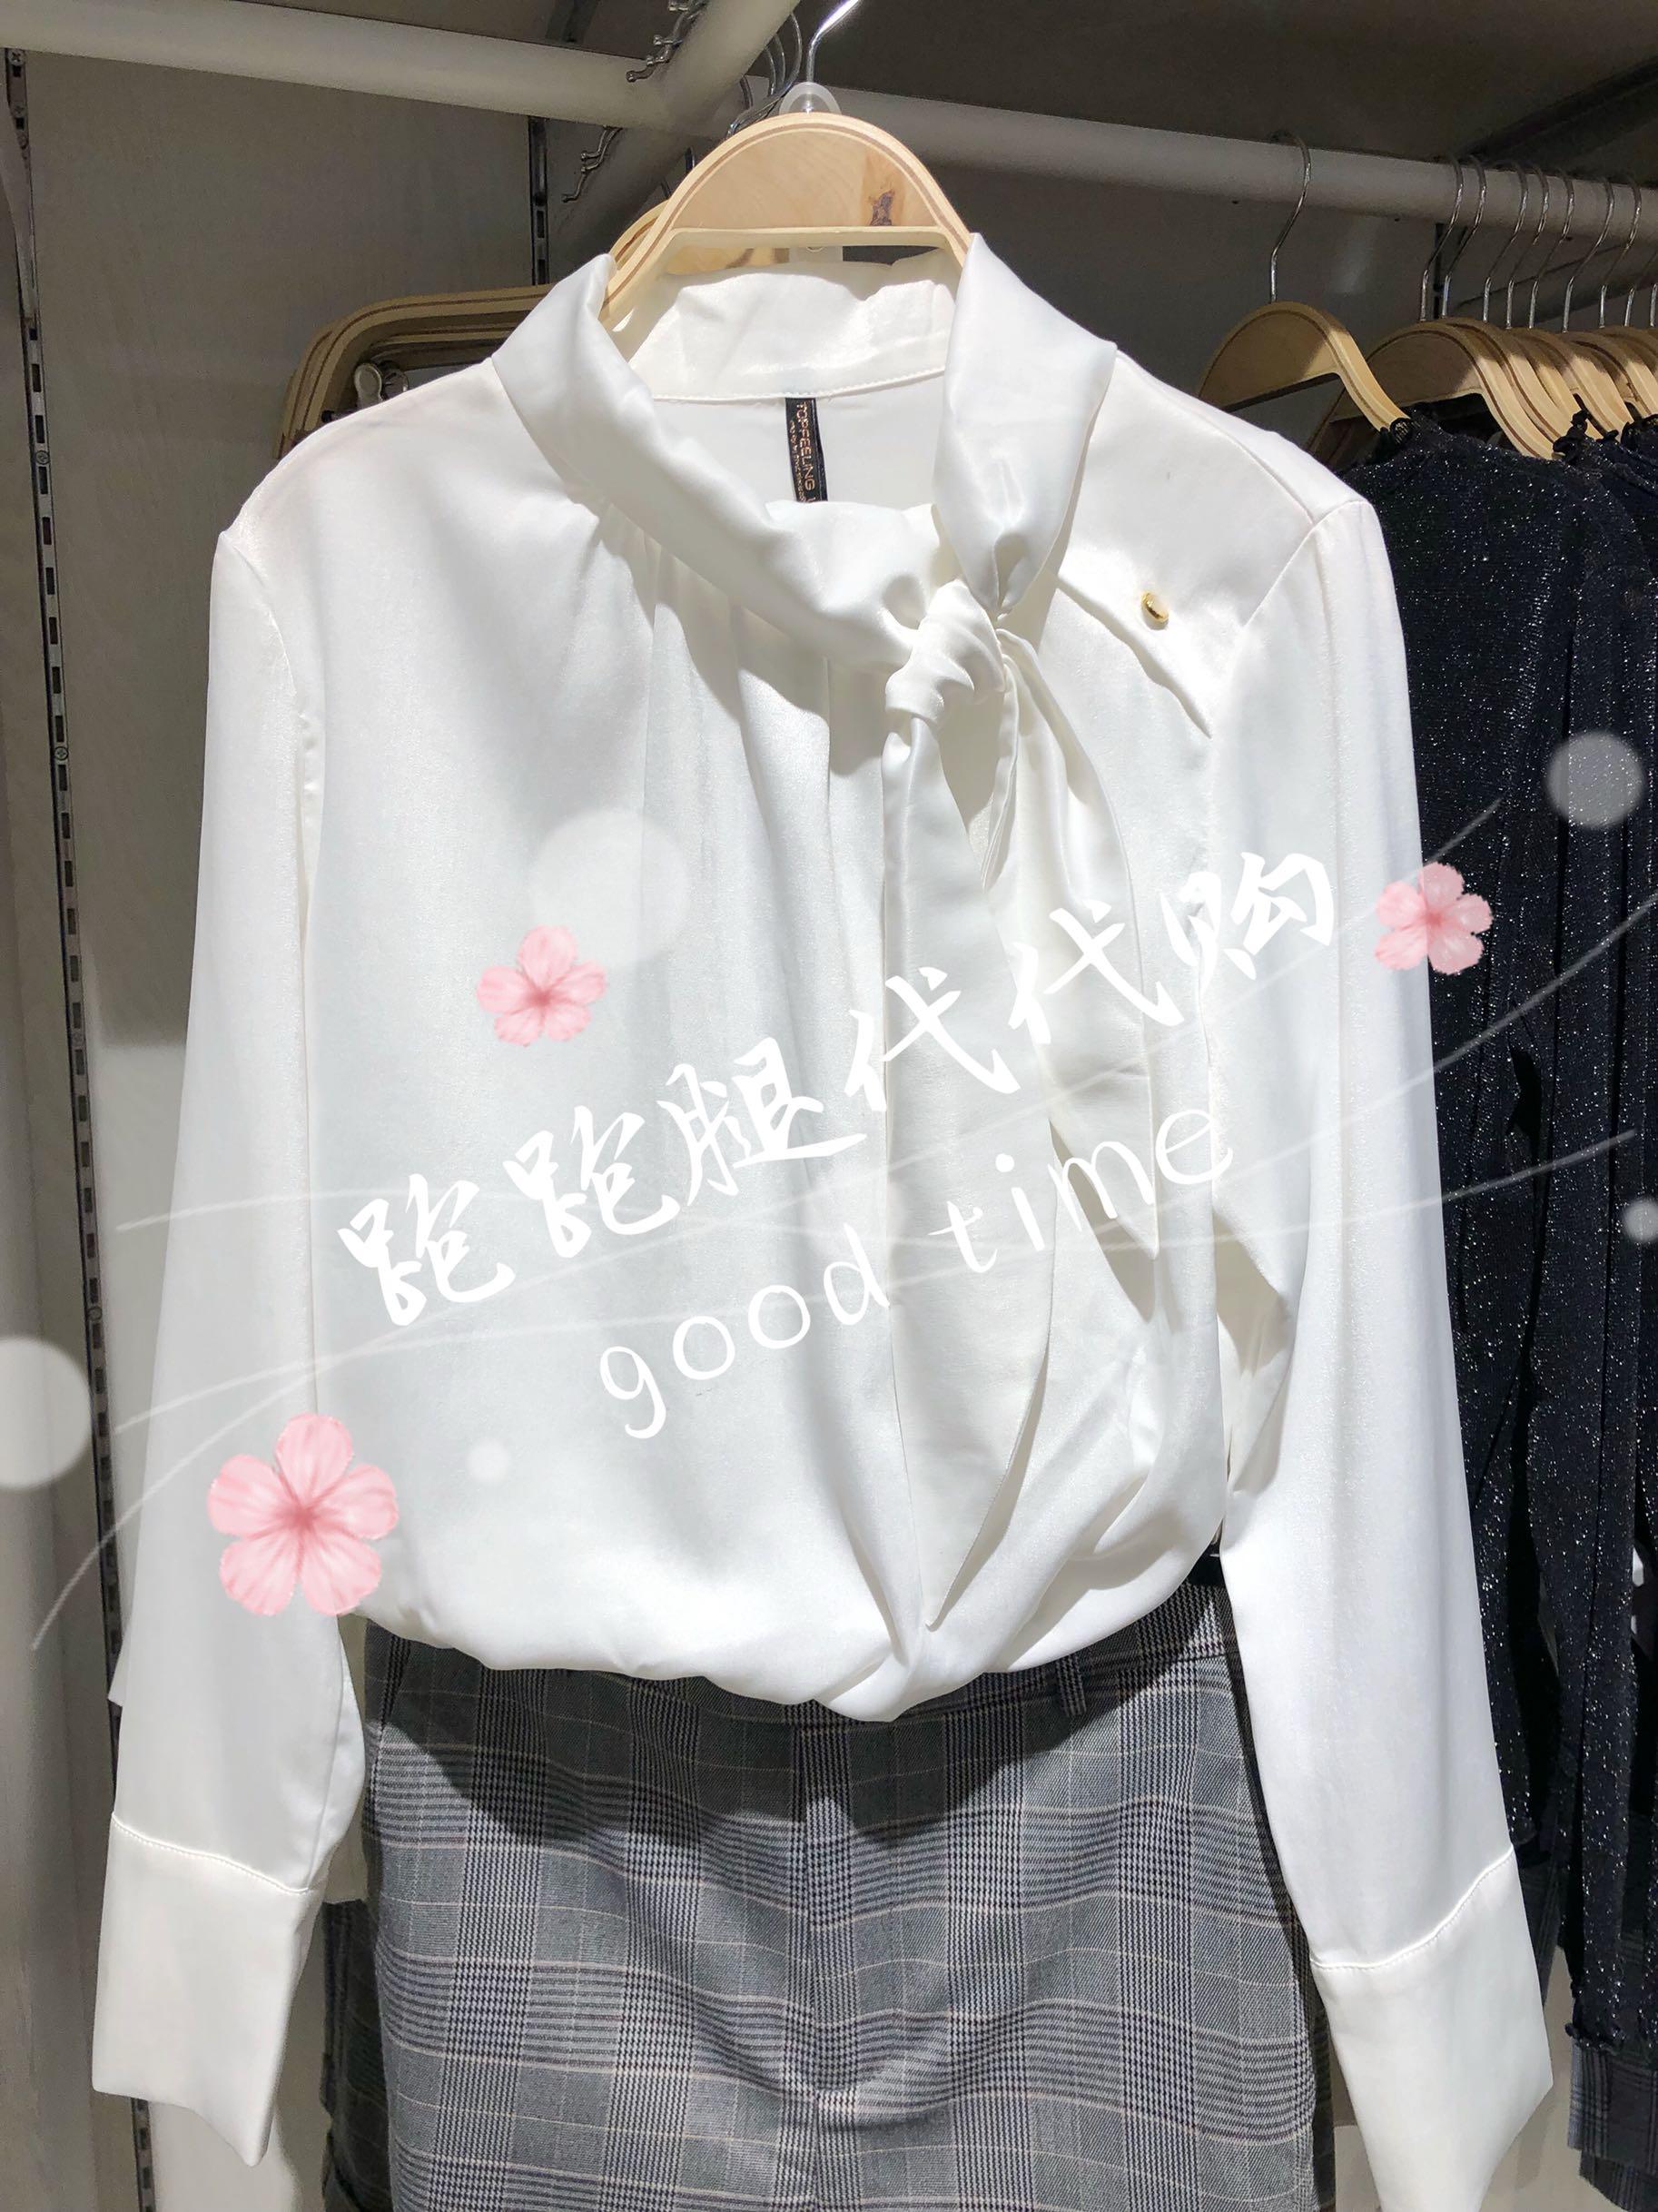 MJstyle/topfeeling秋装新款OL气质领口绑带女长袖衬衫719120036